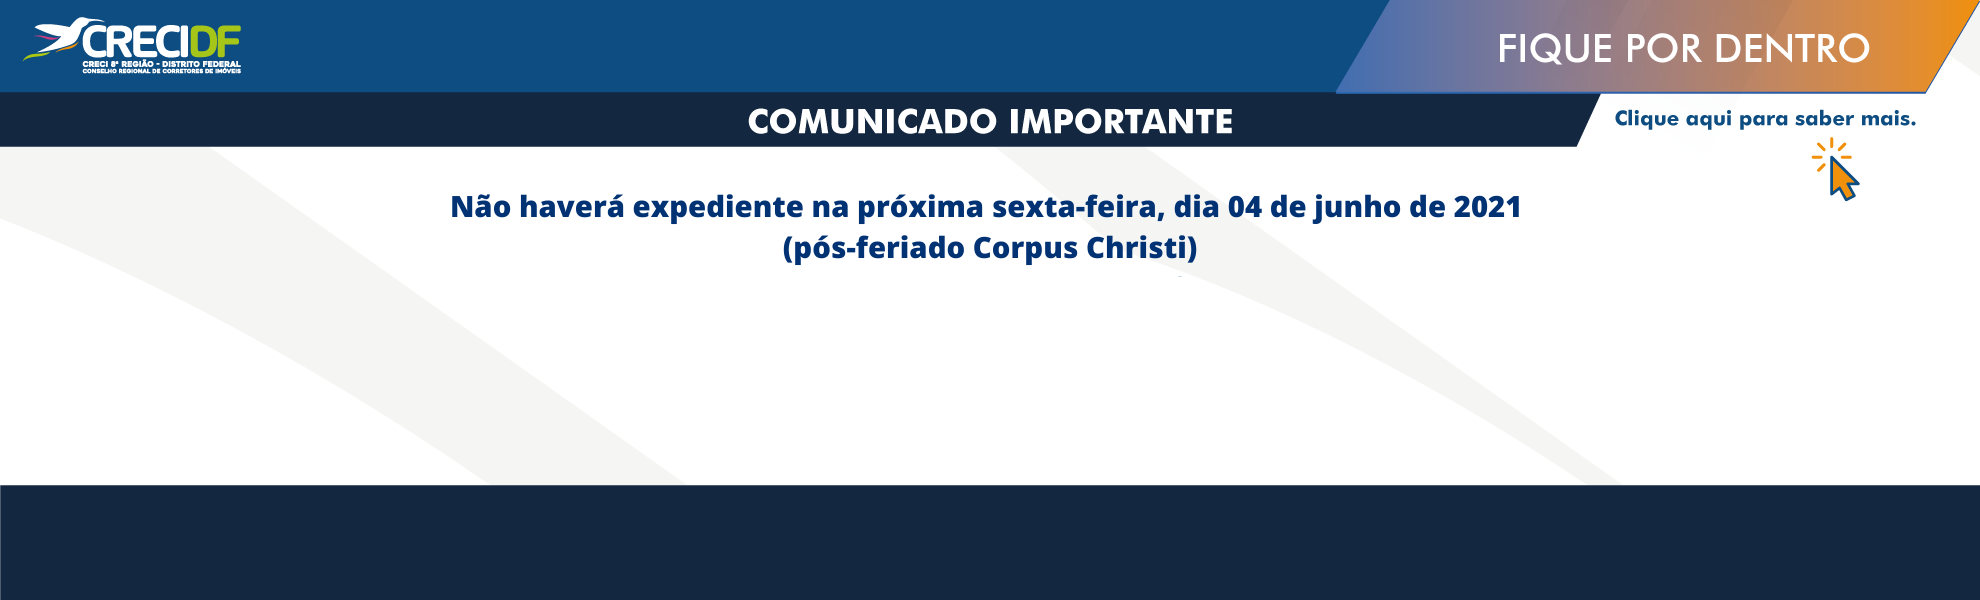 comunicado_aviso